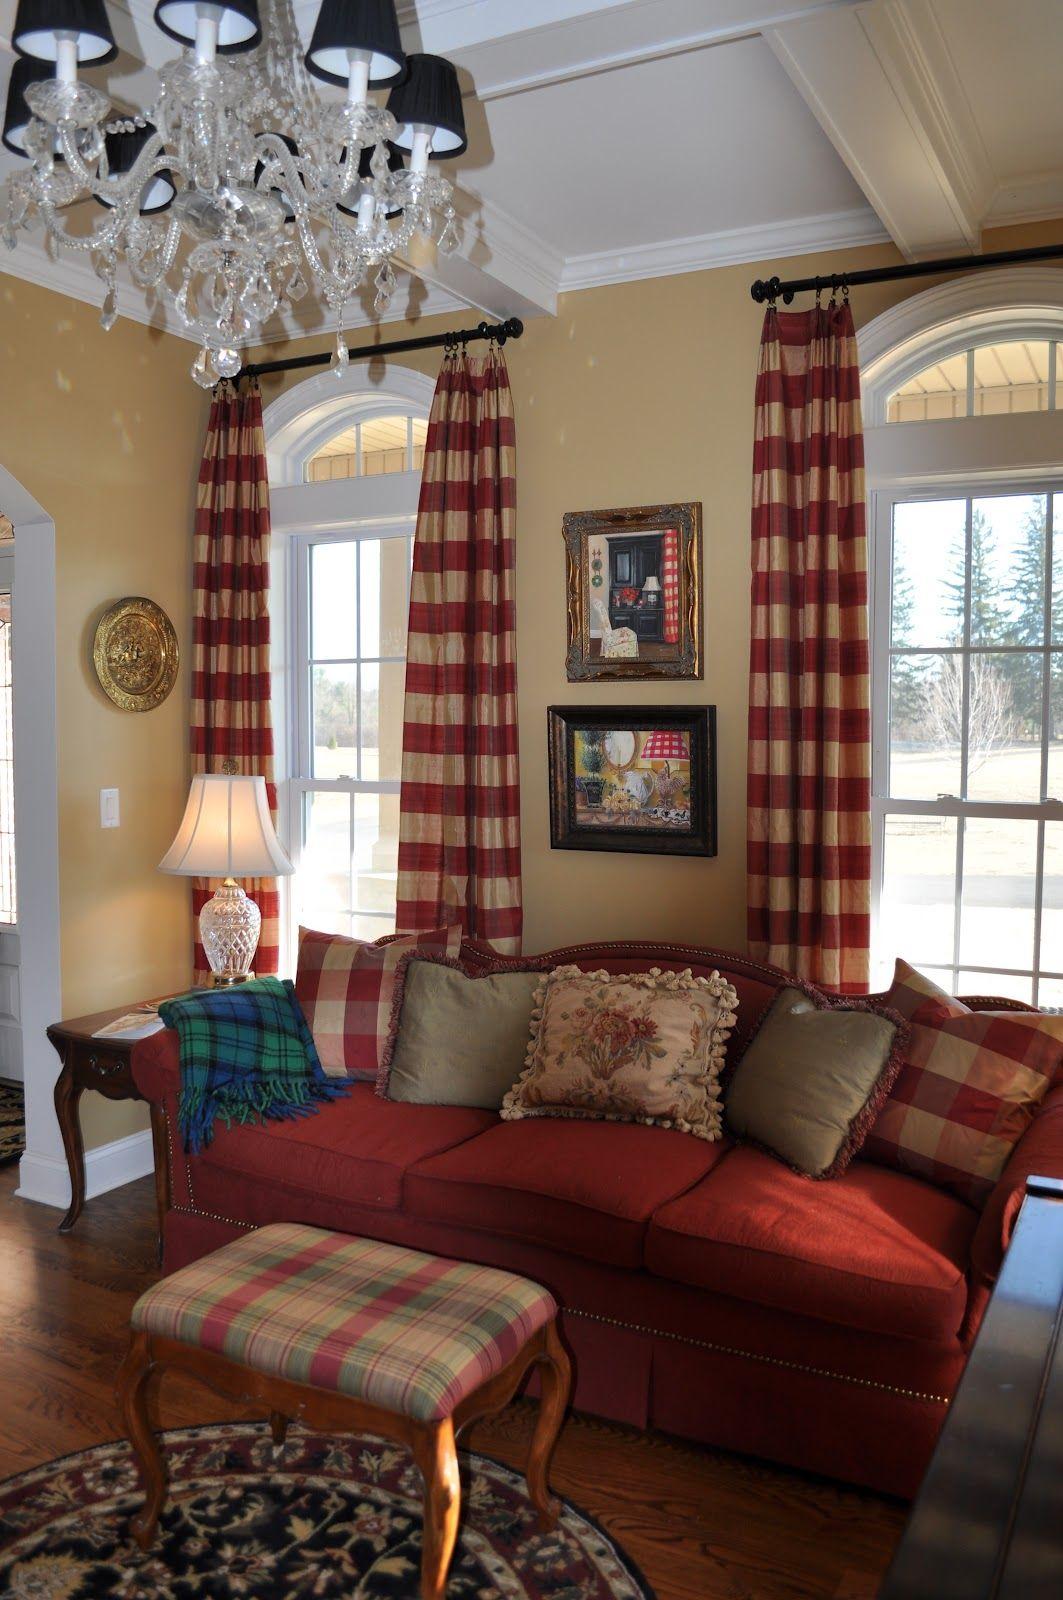 dsc0216 1063×1600 pixels  country living room